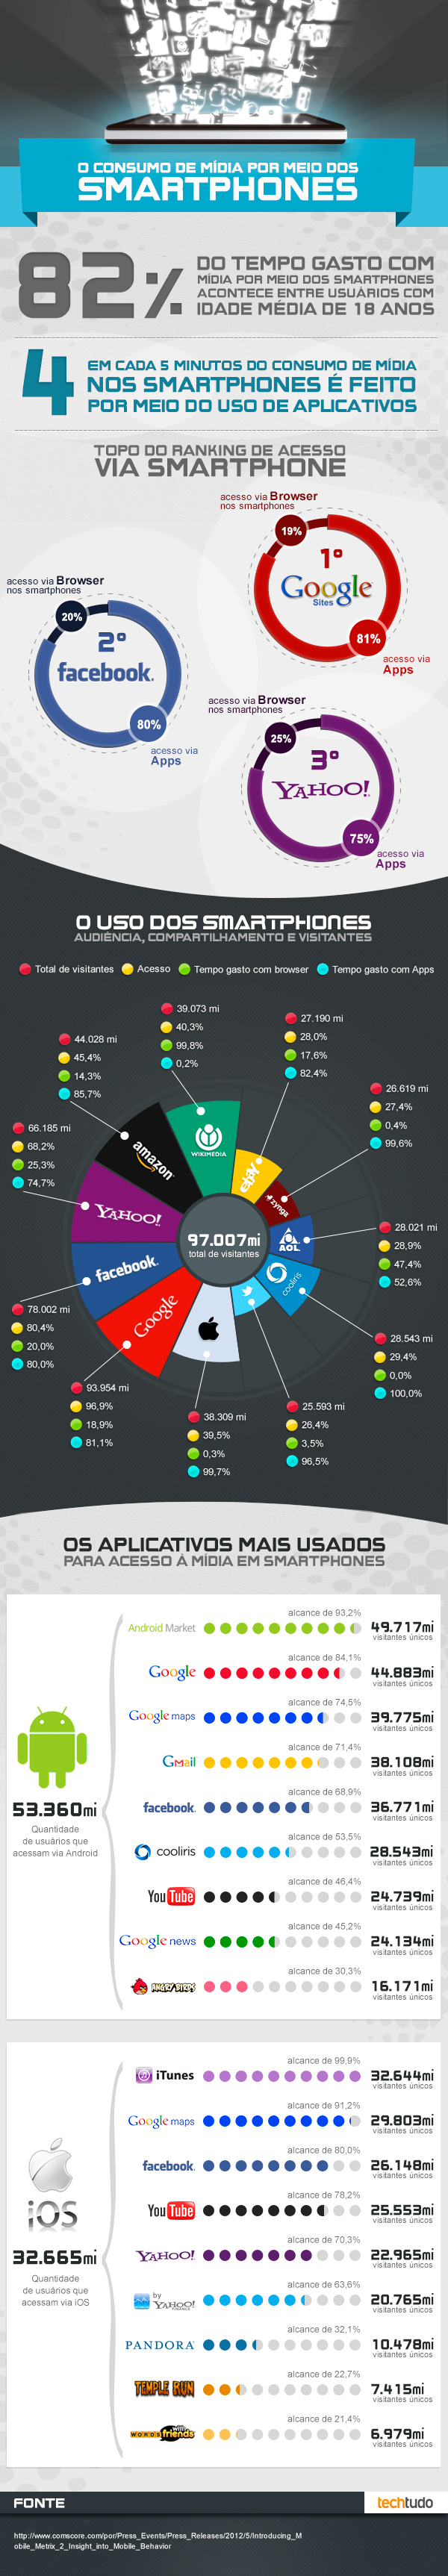 infografico consumo de midia por smartphone (Foto: TechTudo)